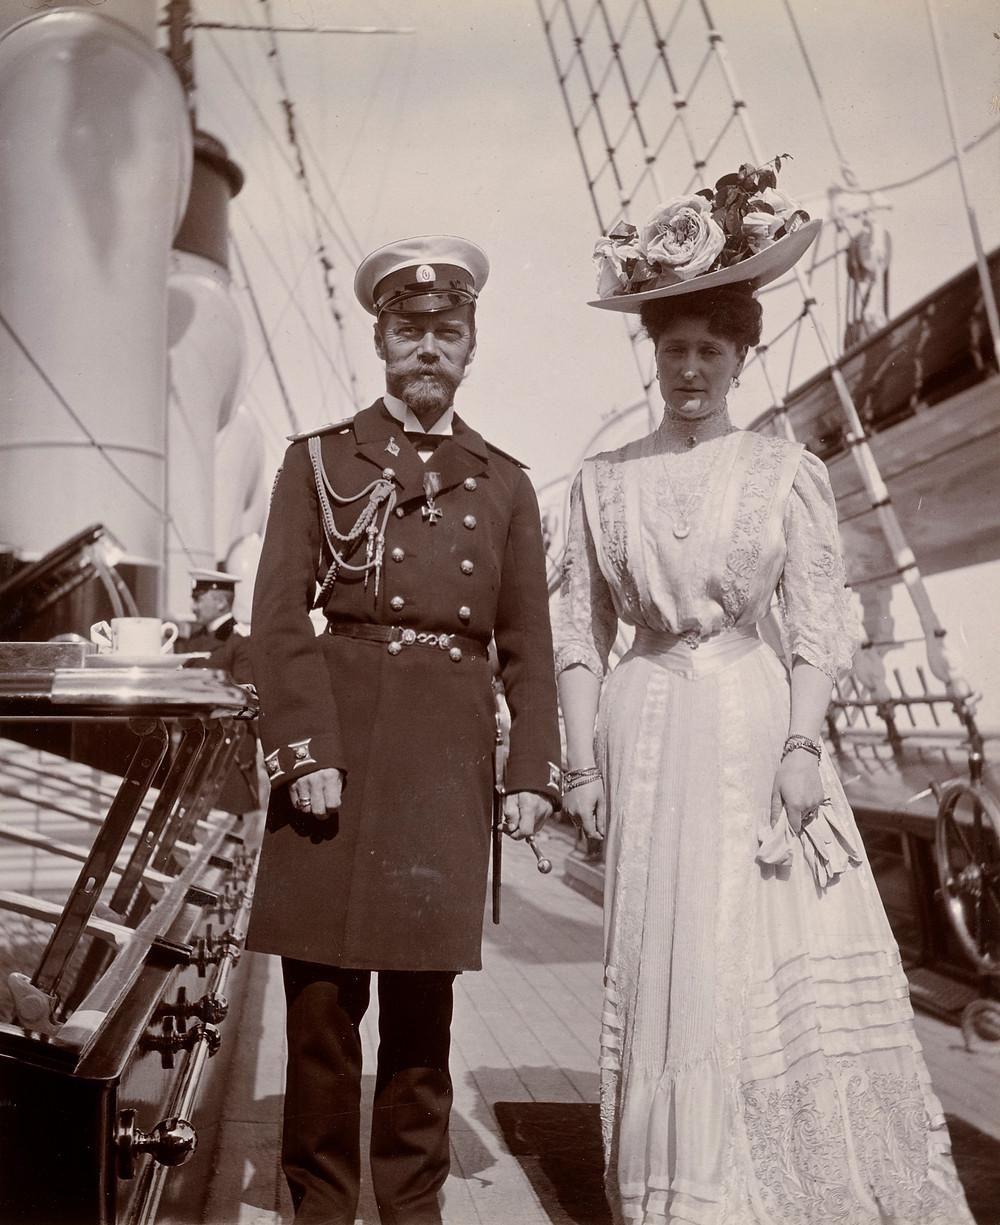 Tsar Nicholas II and Empress Alexandra Feodorovna, Jun 1908. Royal Collection Trust/© Her Majesty Queen Elizabeth II 2019